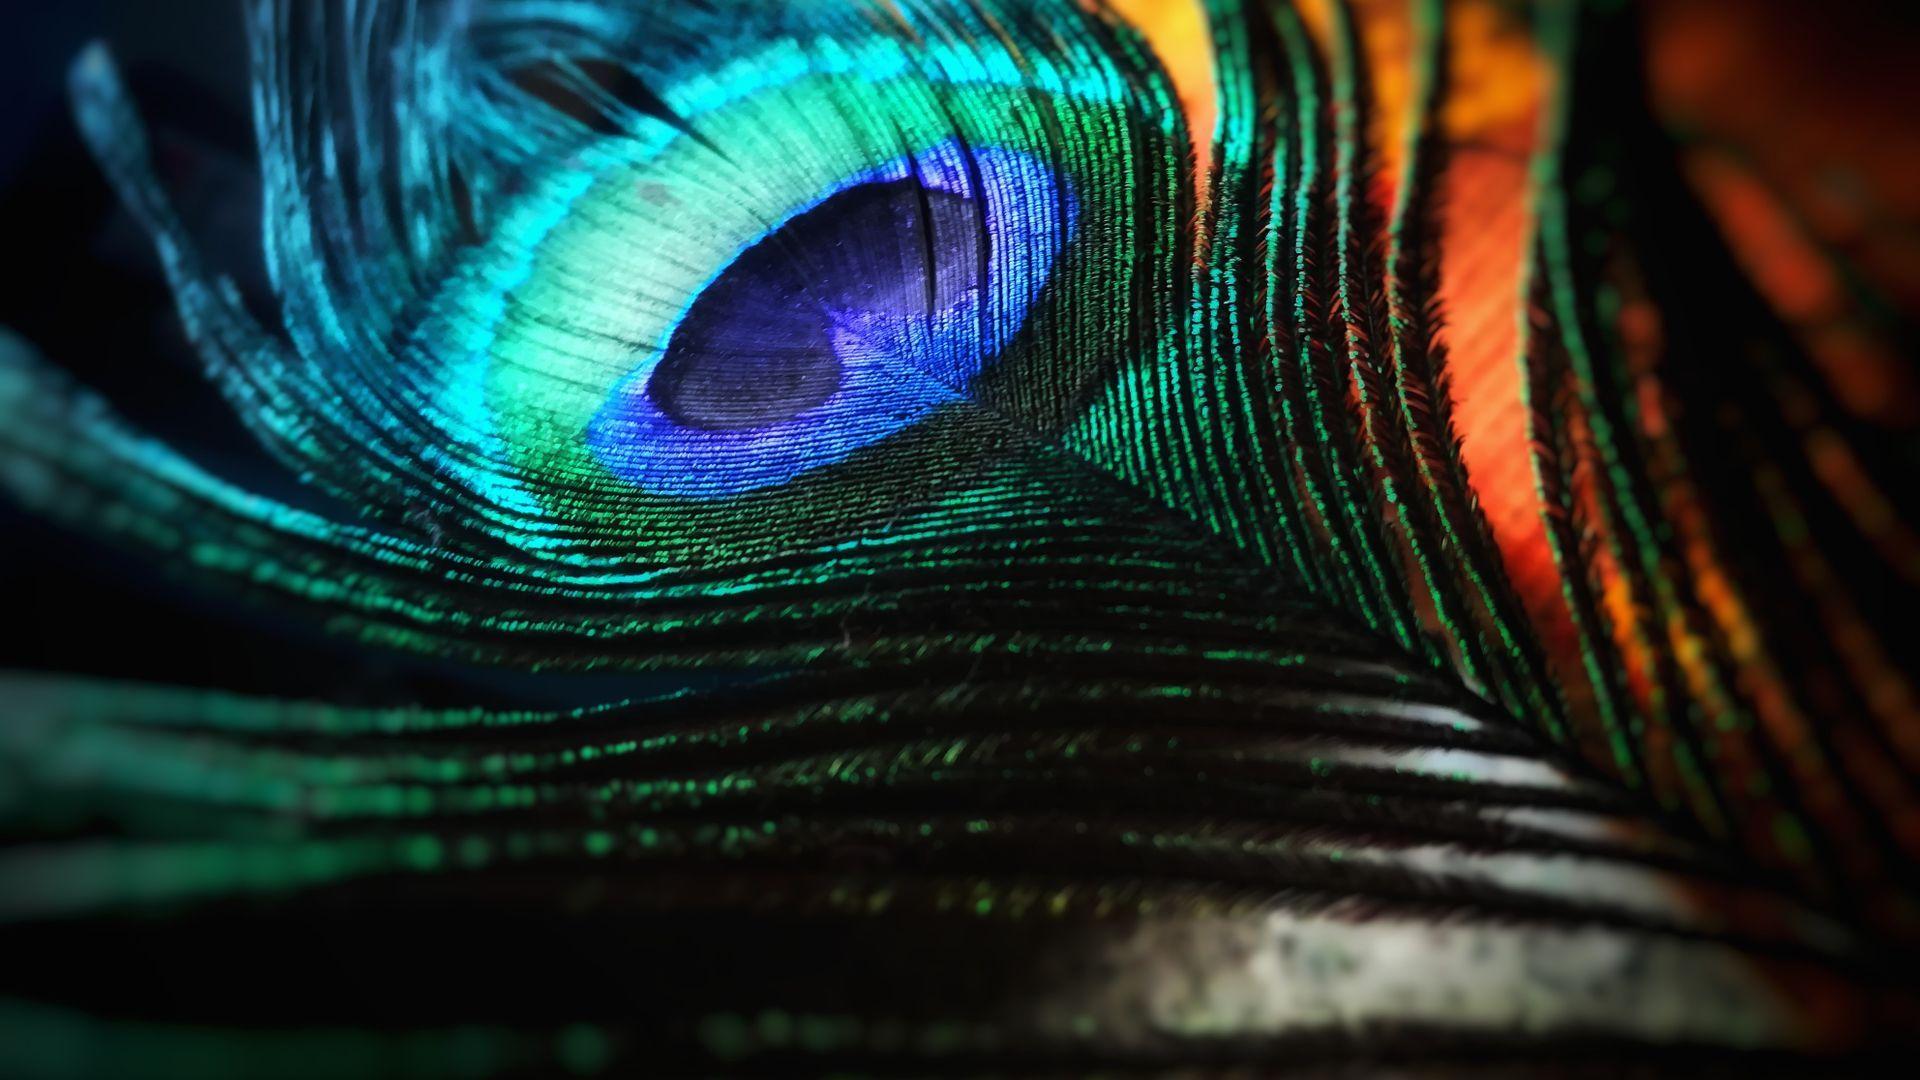 peacock bird images